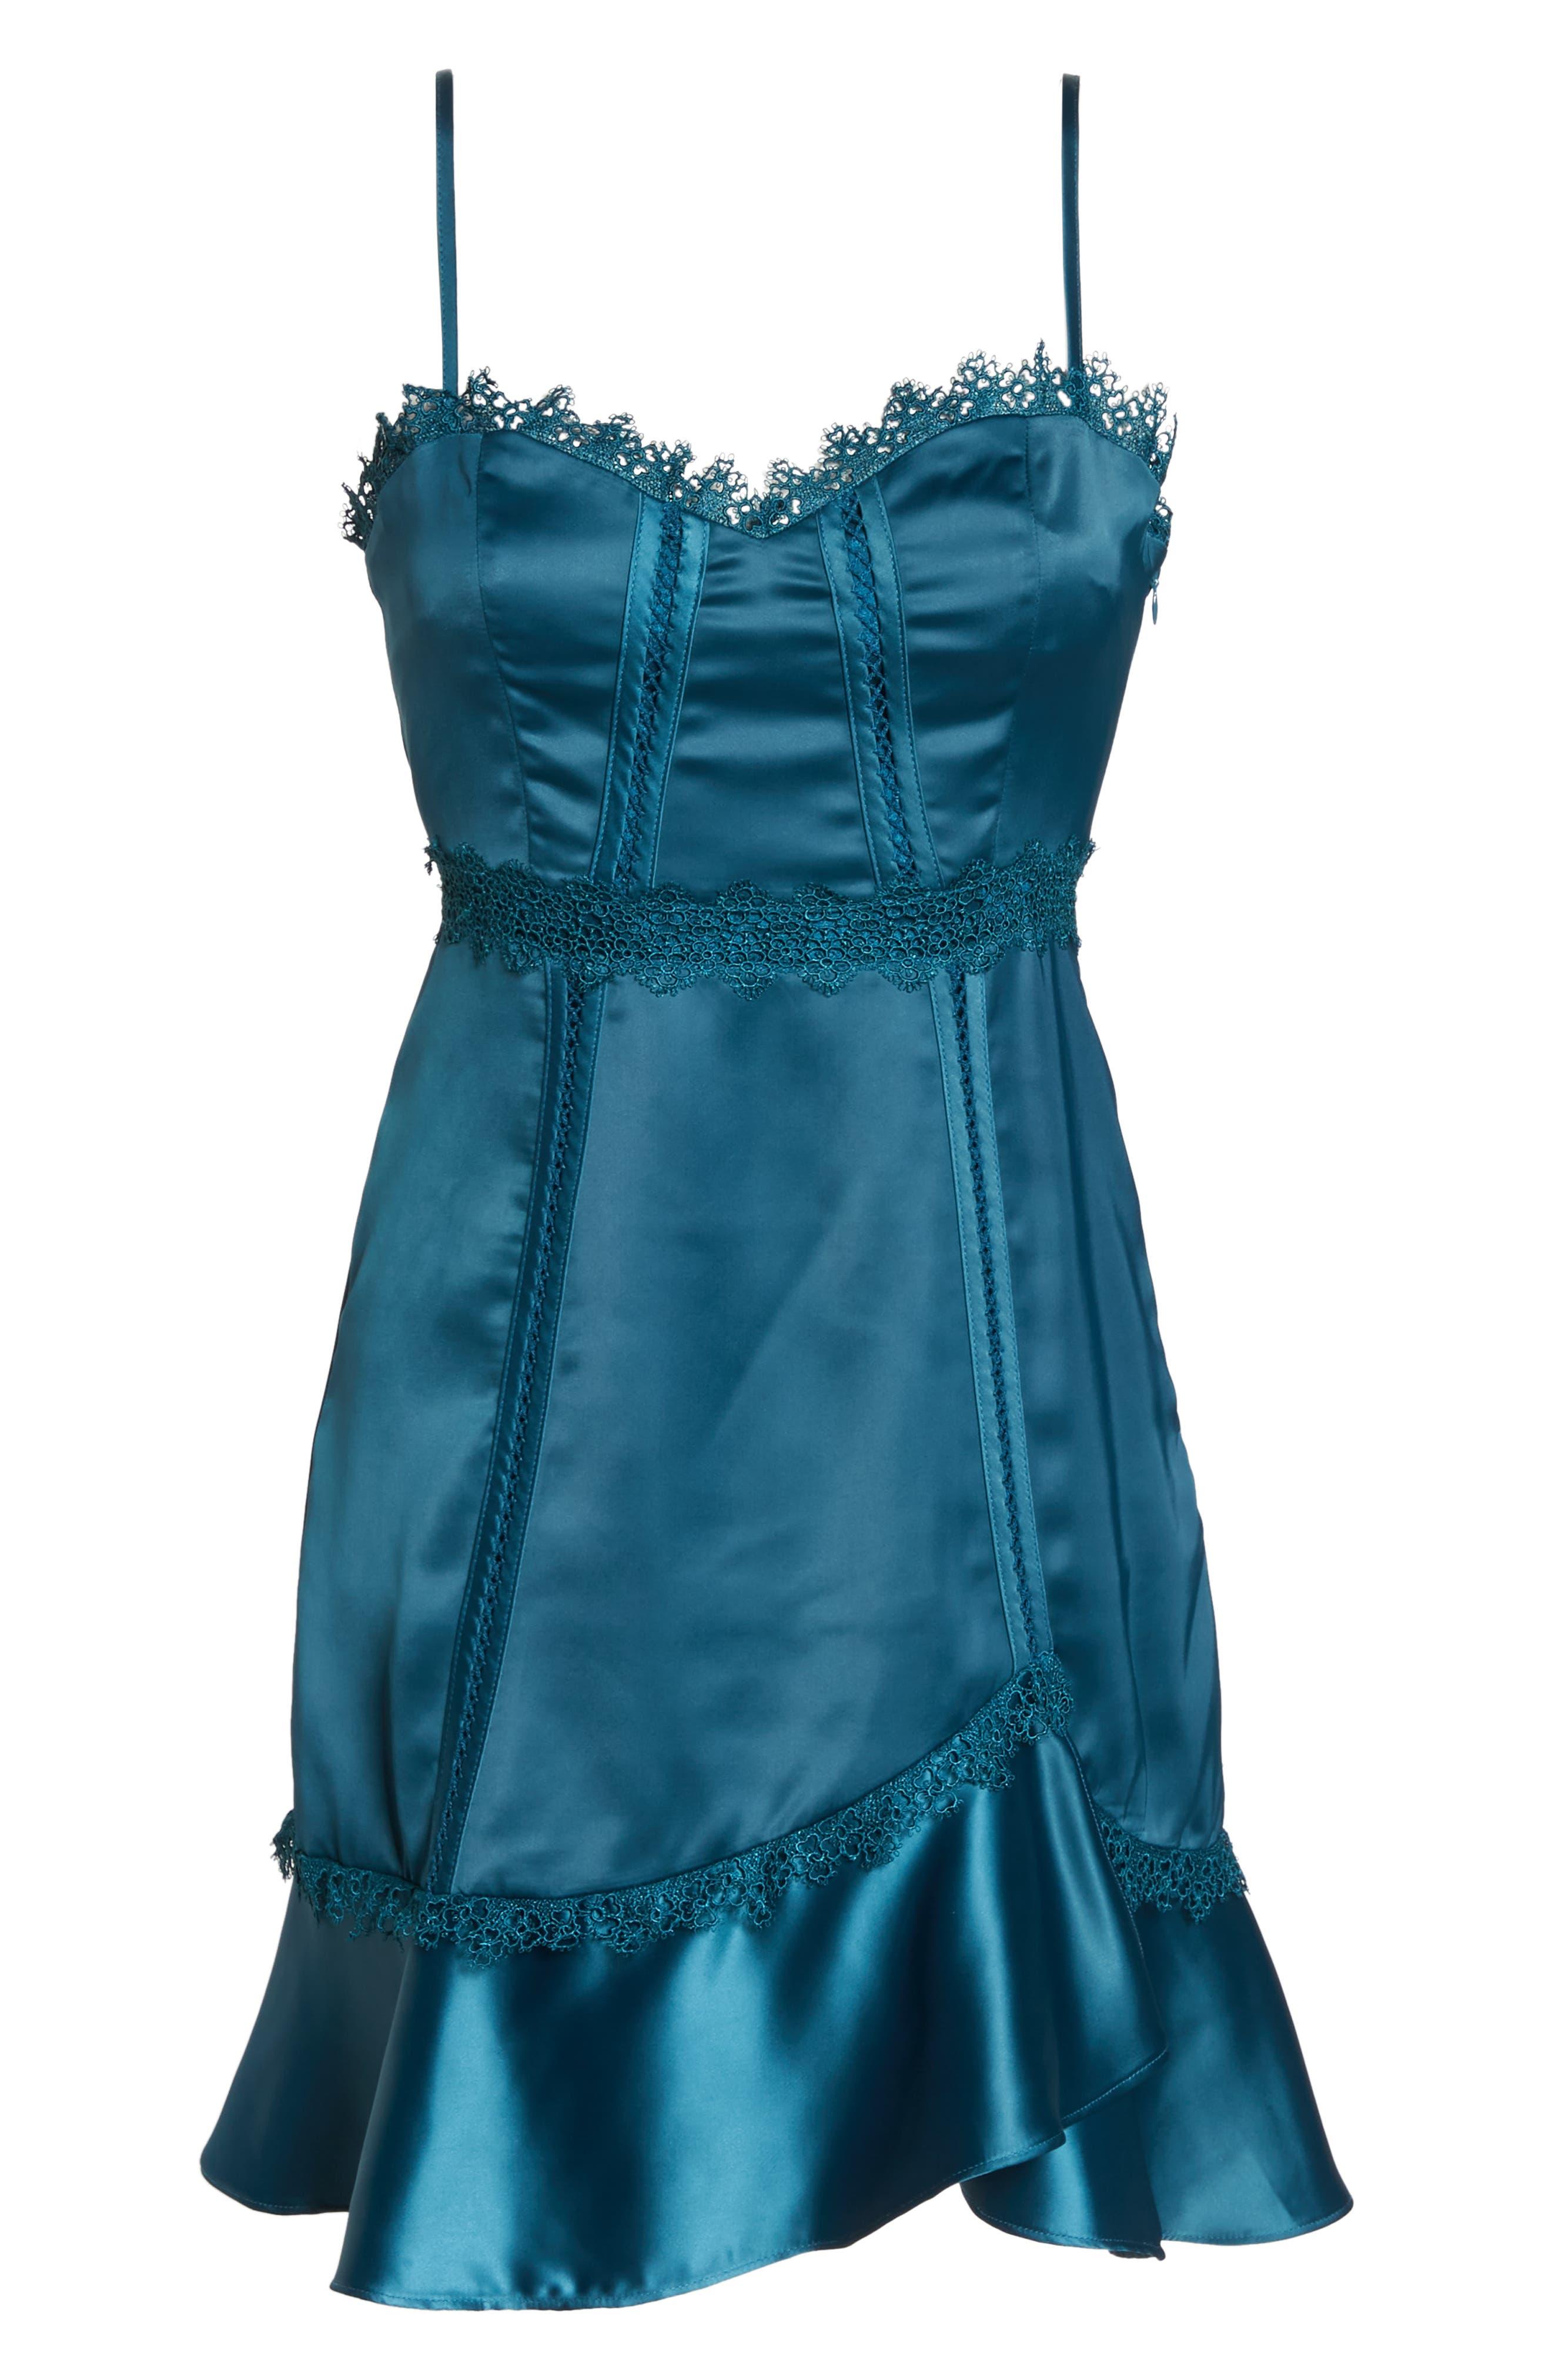 Betty Satin & Soutache Party Dress,                             Alternate thumbnail 7, color,                             TEAL